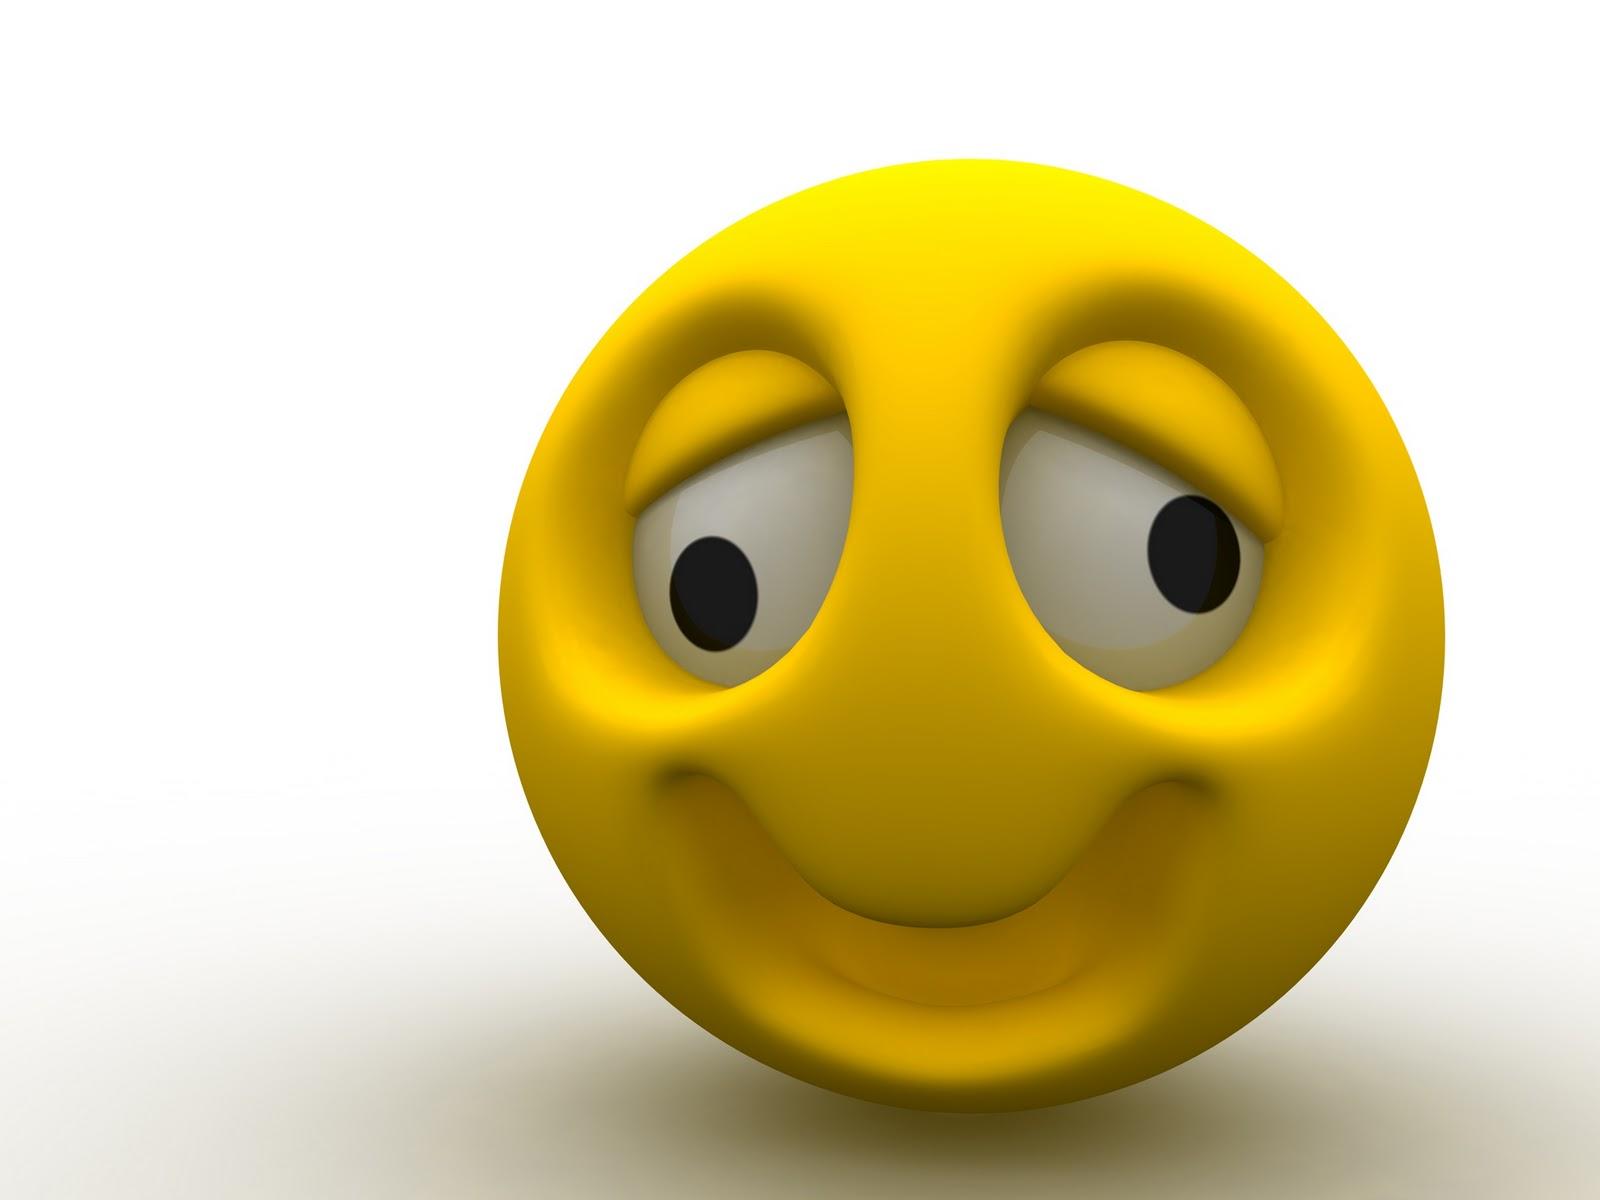 3d Dual Screen Wallpaper Wallpaperfreeks Hd Smile Emoticons Wallpapers